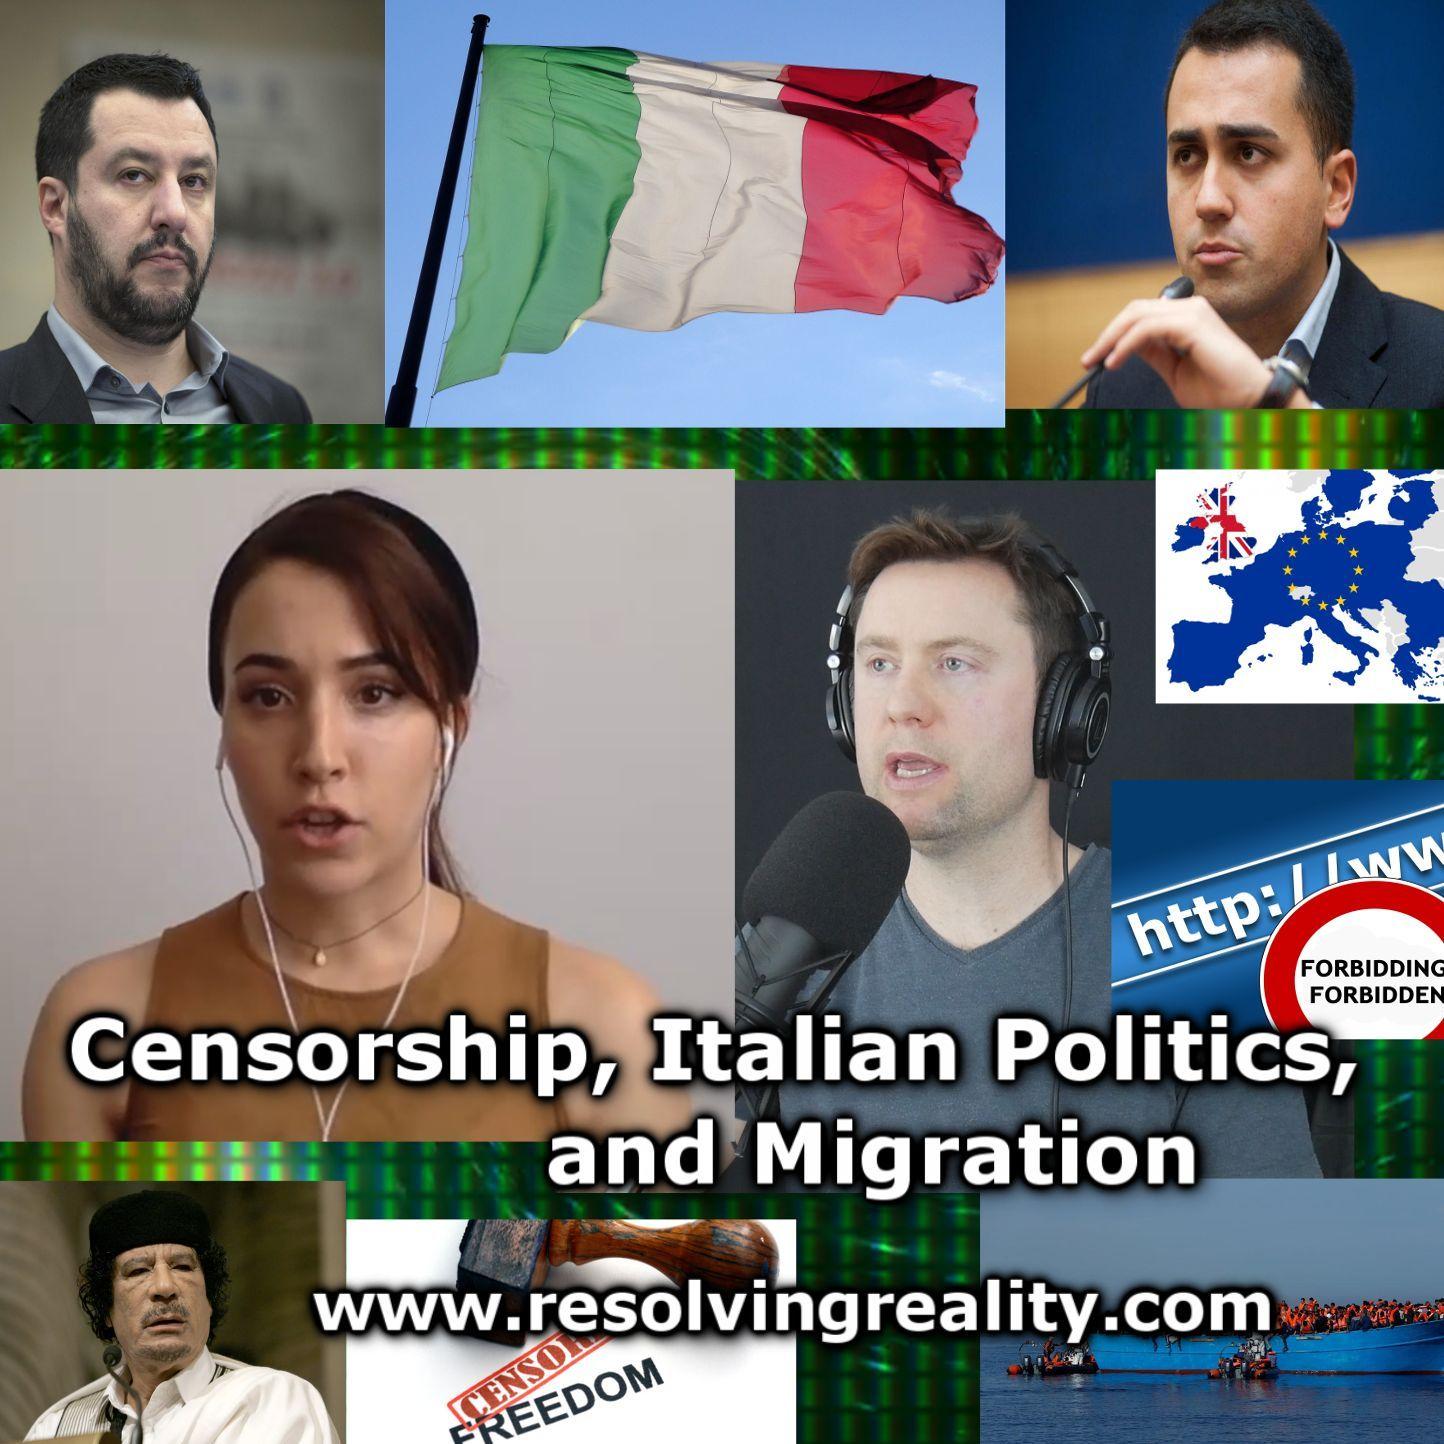 Censorship, Italian Politics, and Migration - Alessandra Bocchi on Resolving Reality